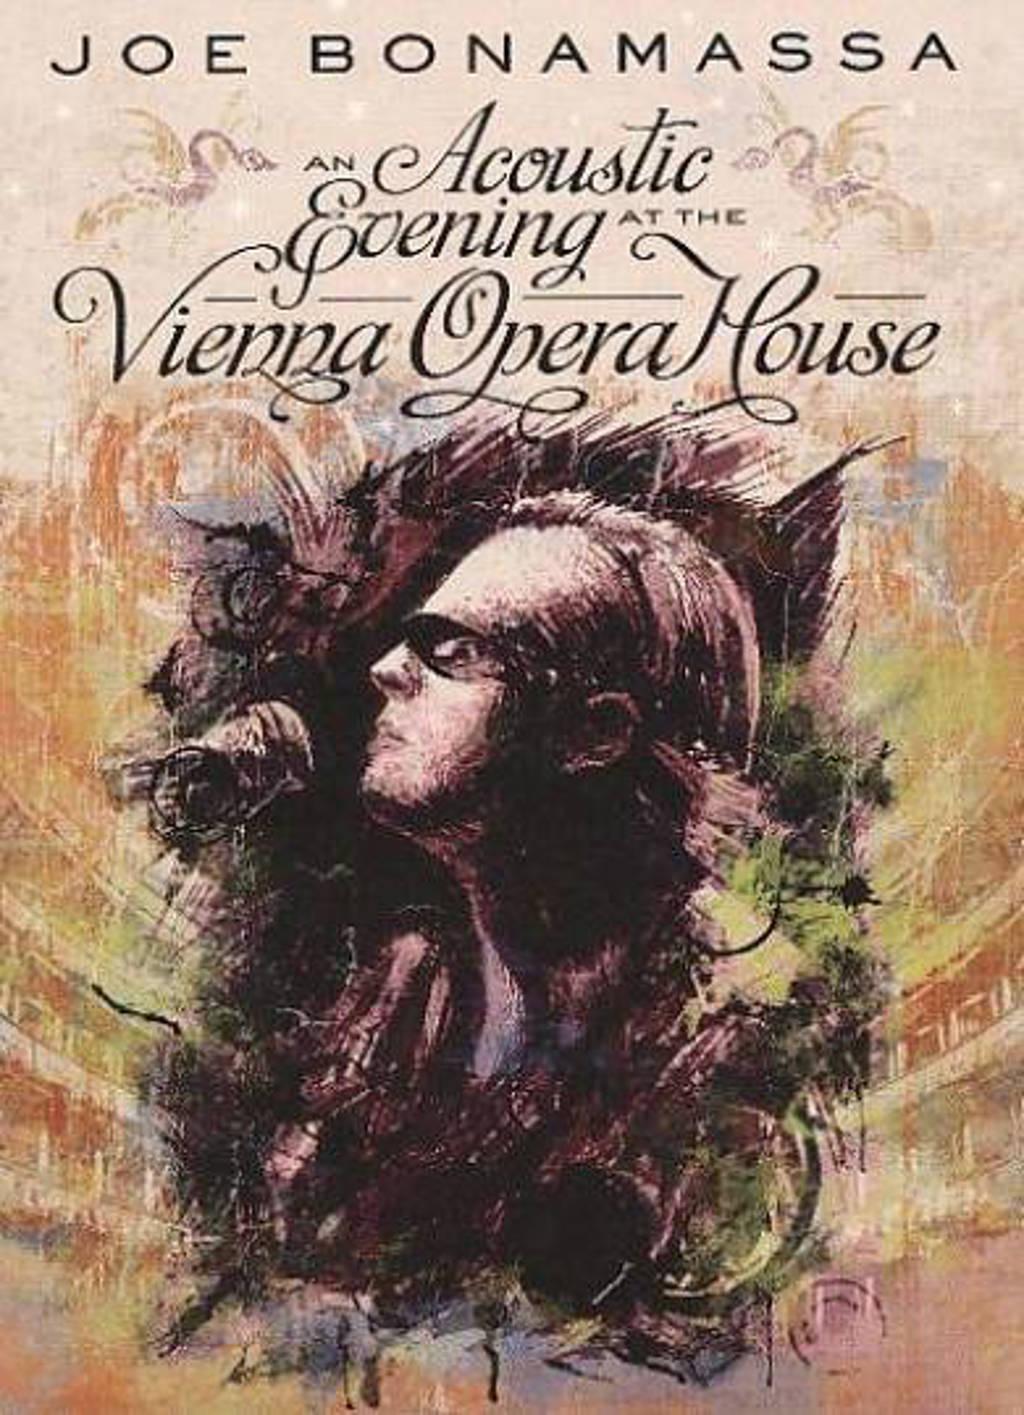 Joe Bonamassa - An acoustic evening at The Vienna Opera House (DVD)